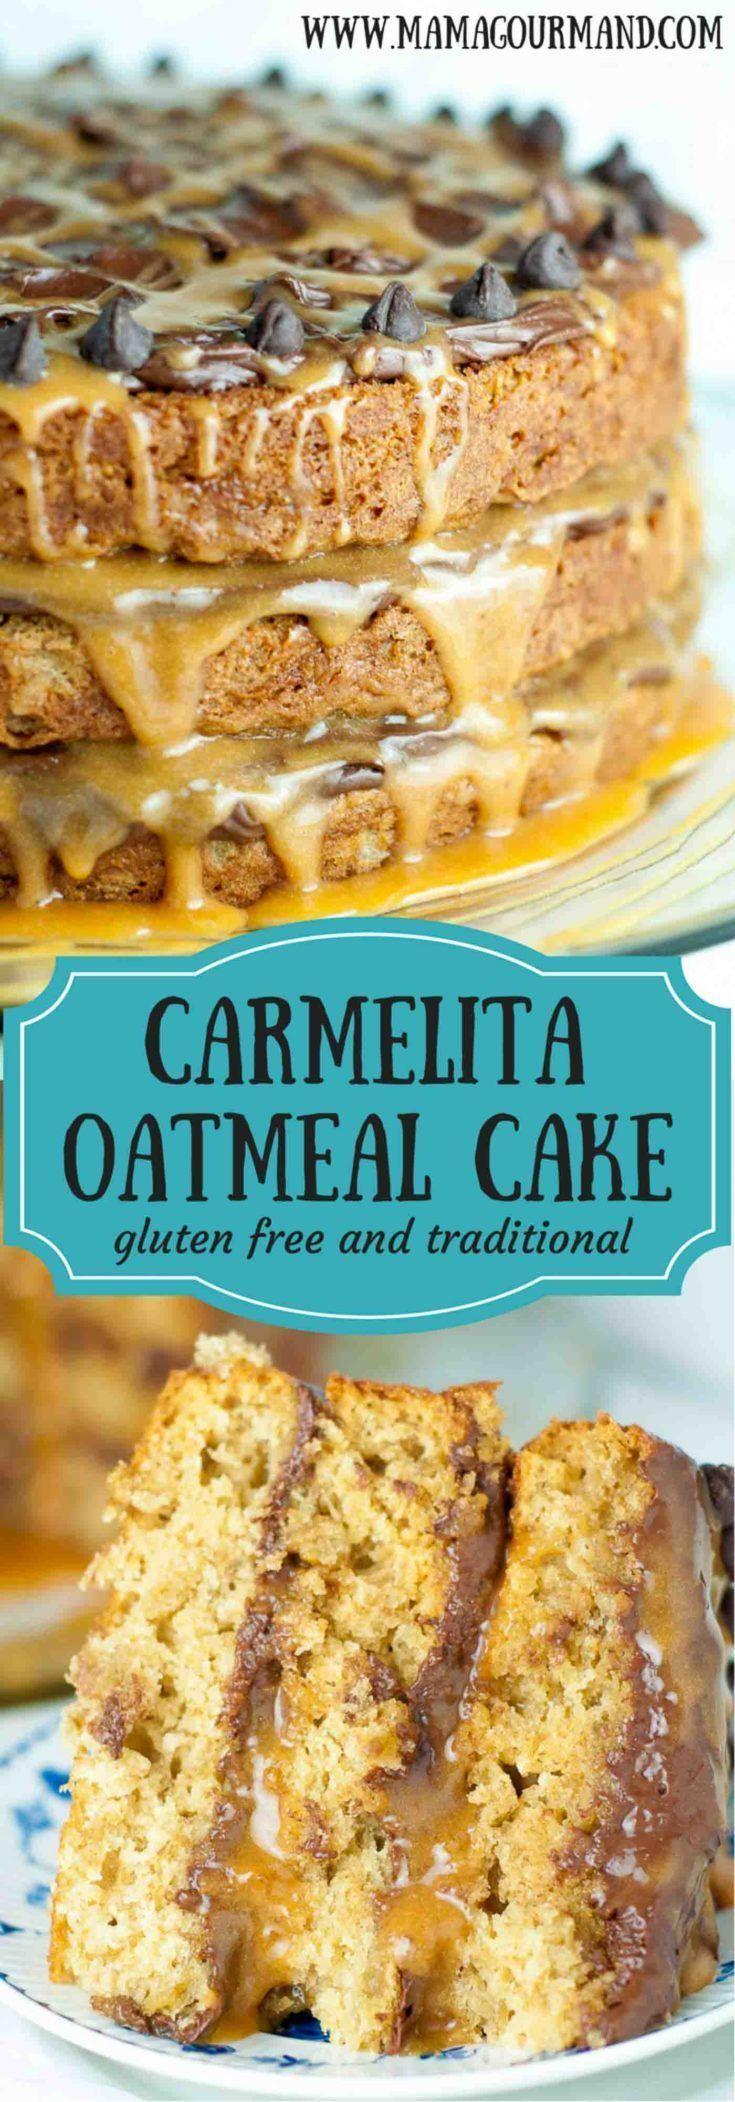 1817 best Gluten Free Baking images on Pinterest   Glutenfree ...